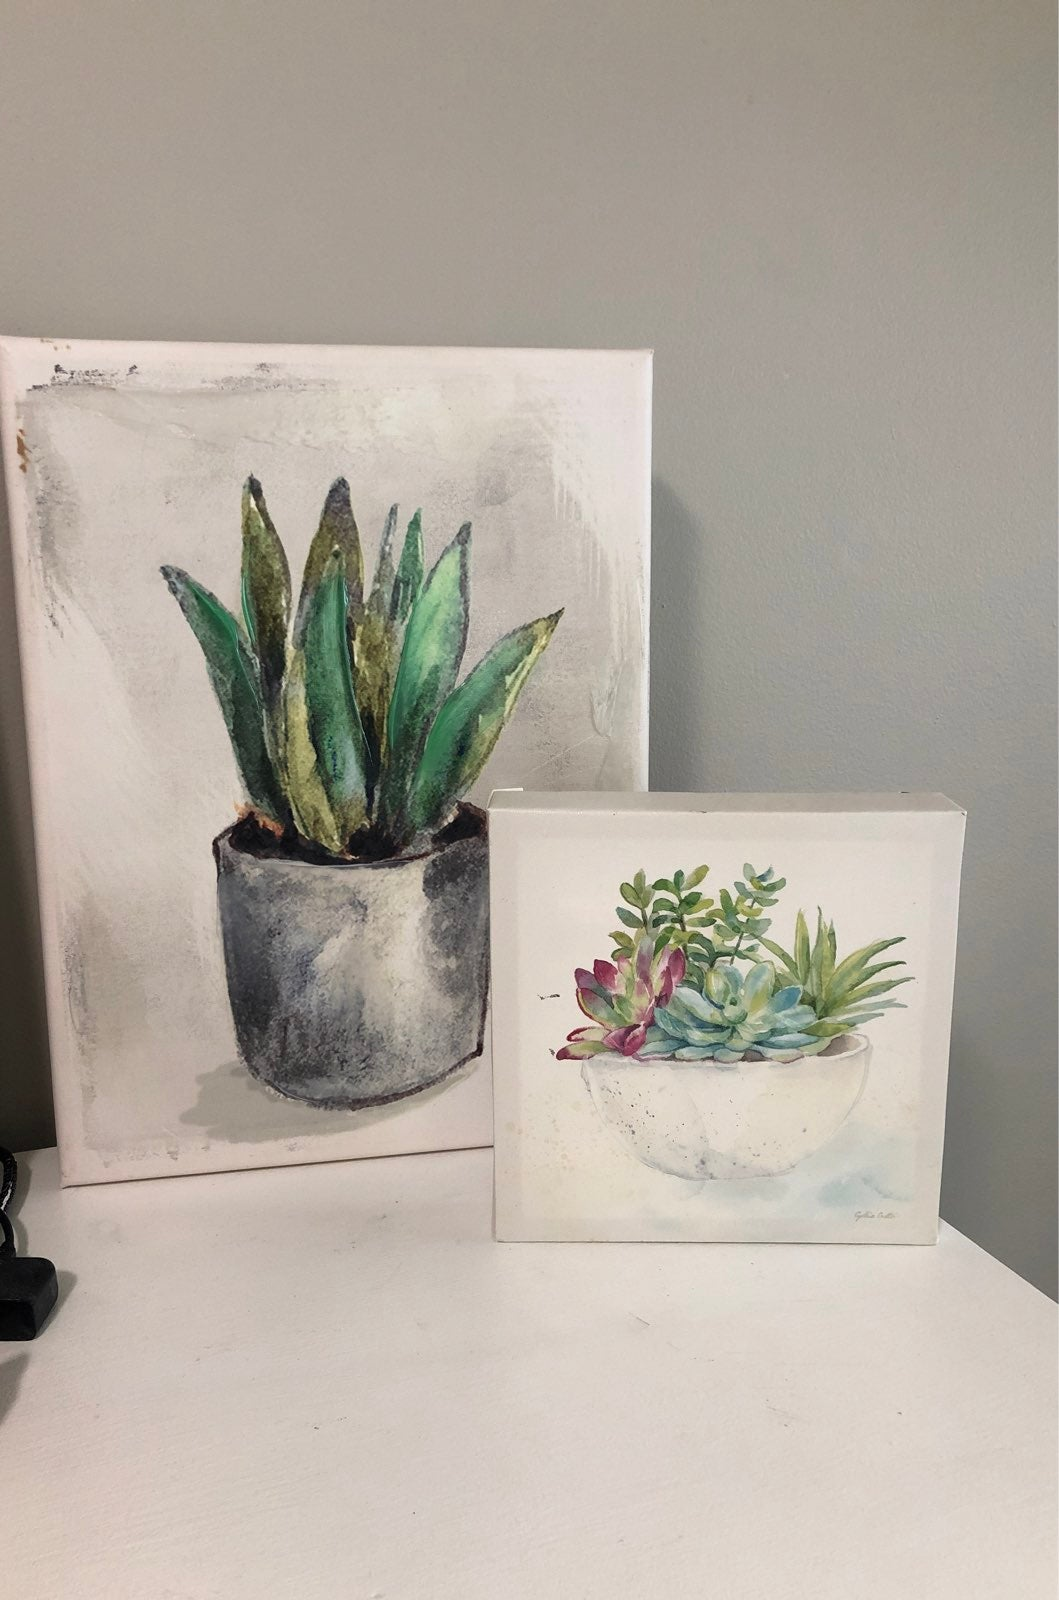 canvas wall art - plants